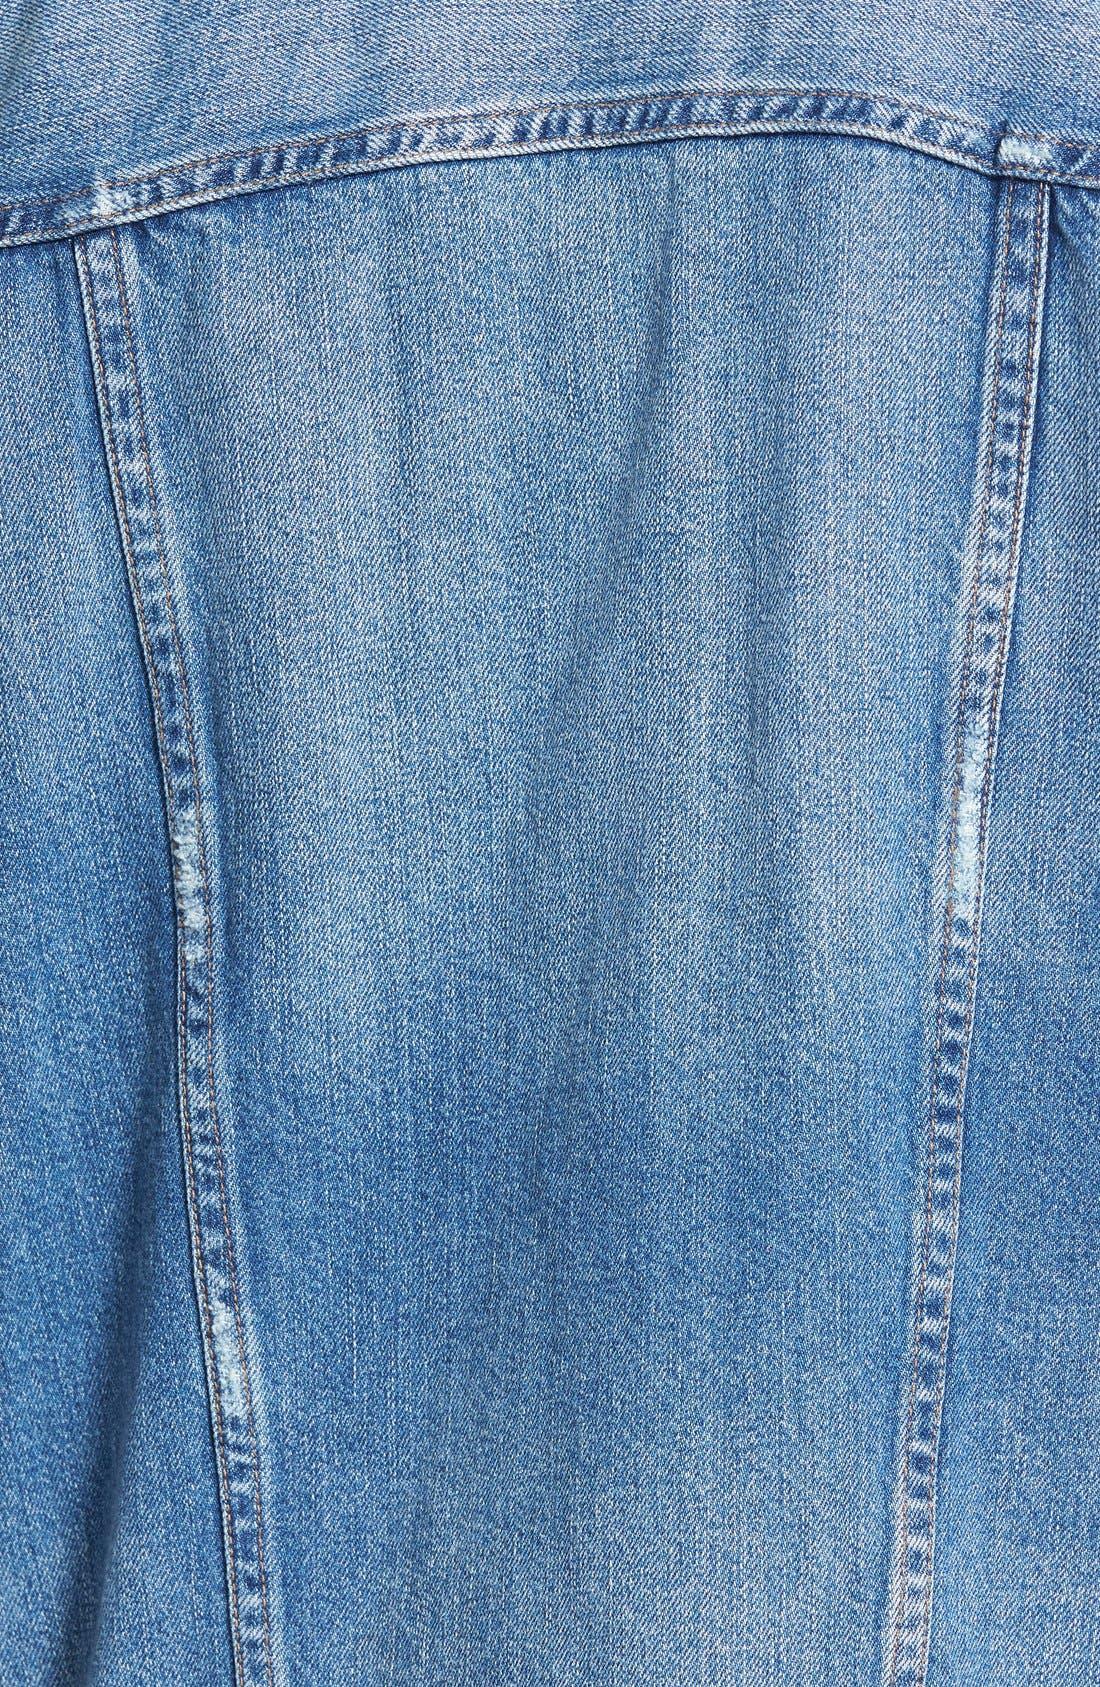 Alternate Image 3  - Madewell Oversize Jean Jacket